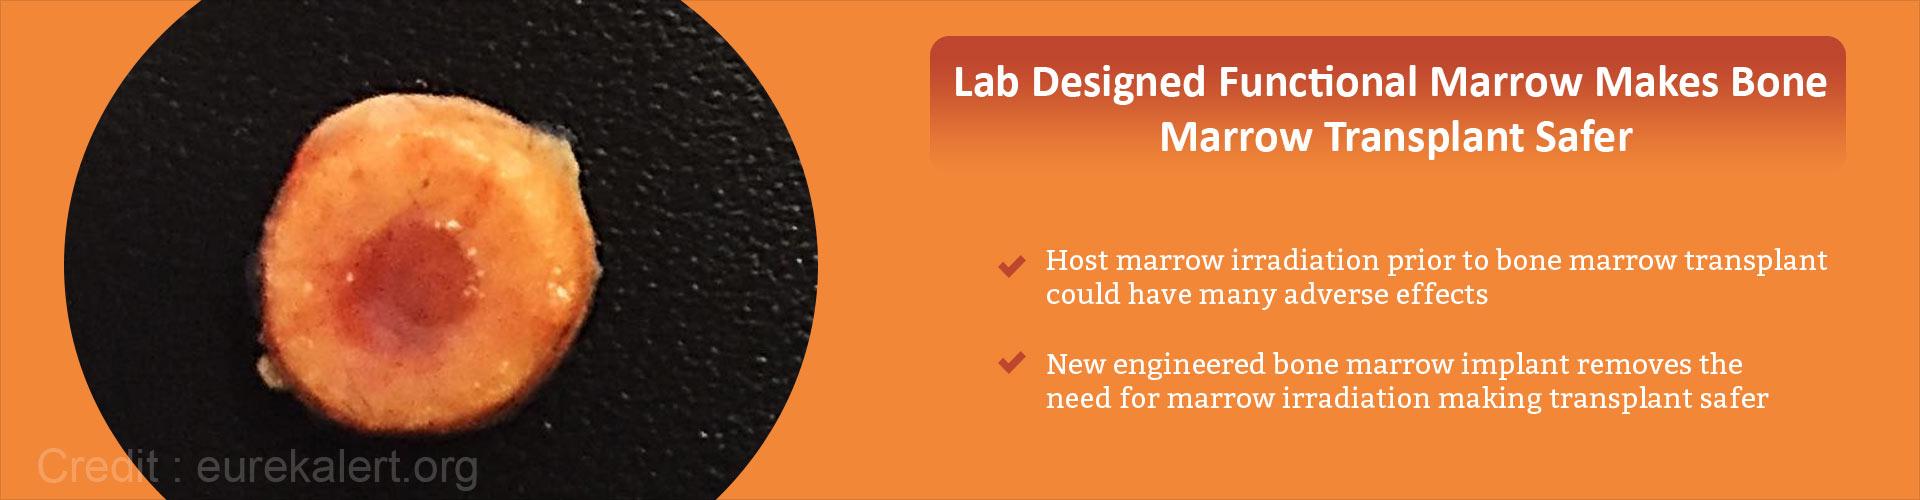 Lab designed functional marrow makes bone marrow transplant safer - Host marrow irradiation prior to bone marrow transplant could have many adverse effects - New engineered bone marrow implant removes the need for marrow irradiation making transplant safer